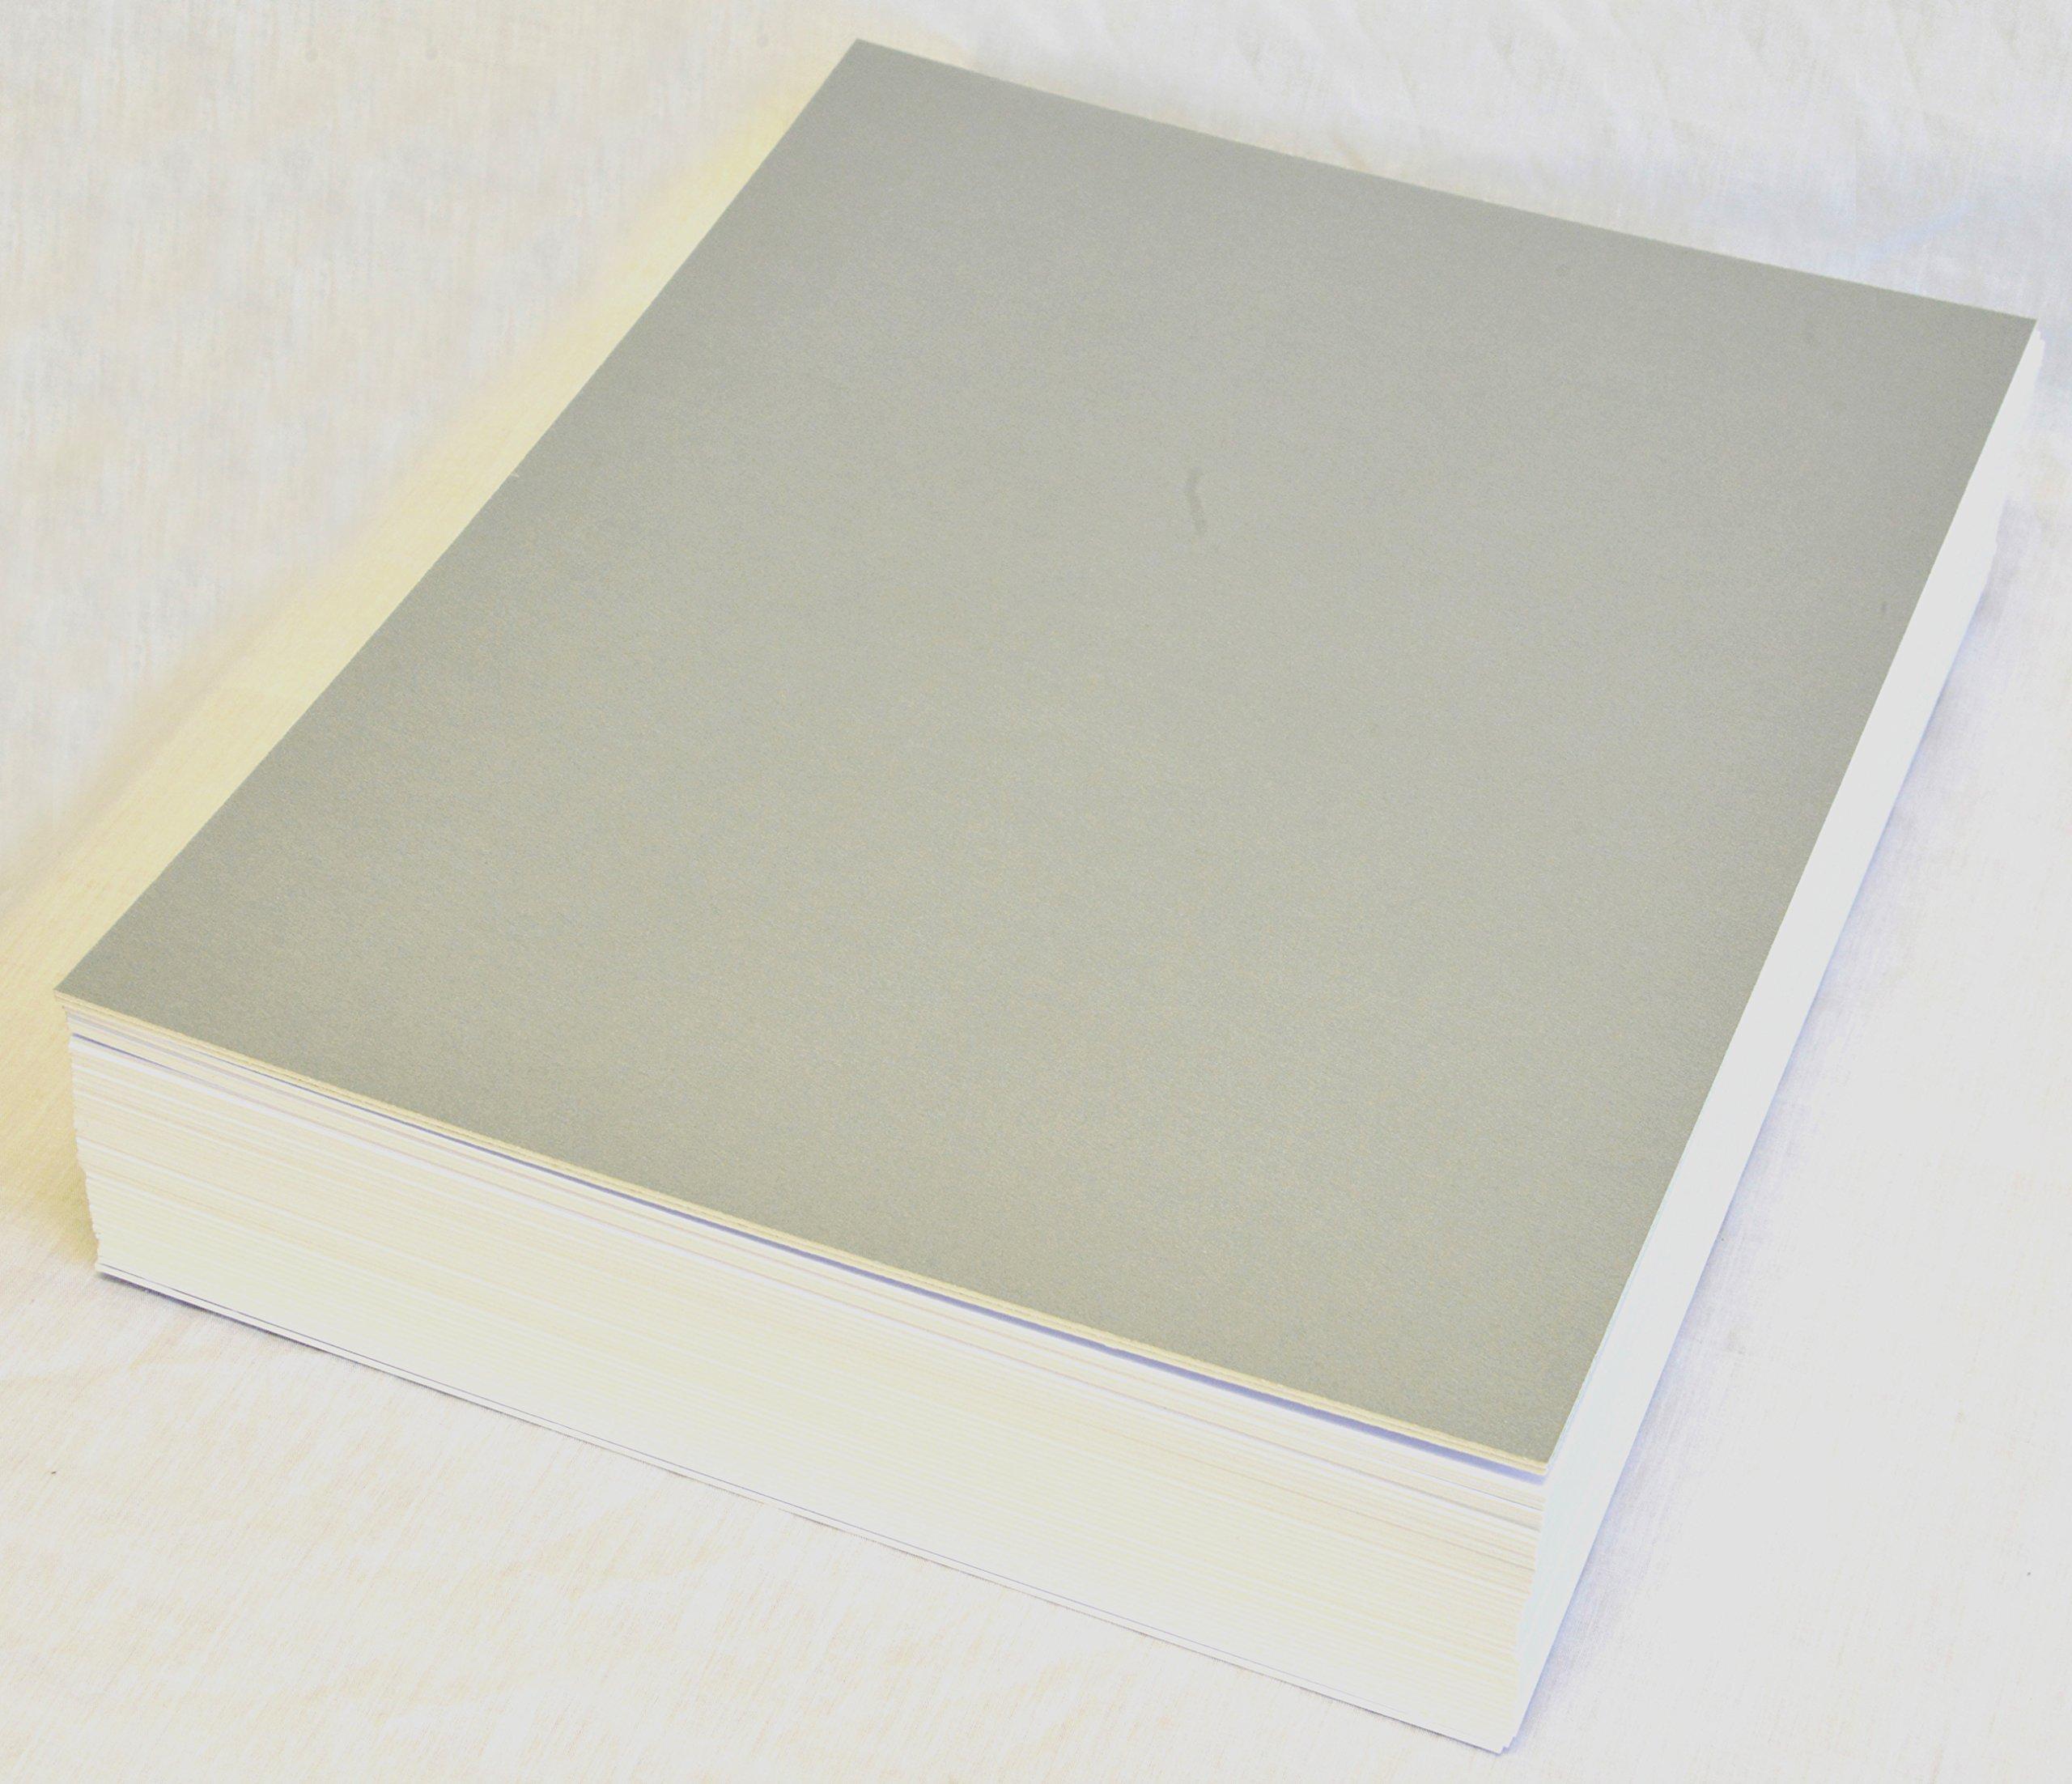 topseller100, Pack of 30 sheets 30x42 UNCUT matboard / mat boards (silver)